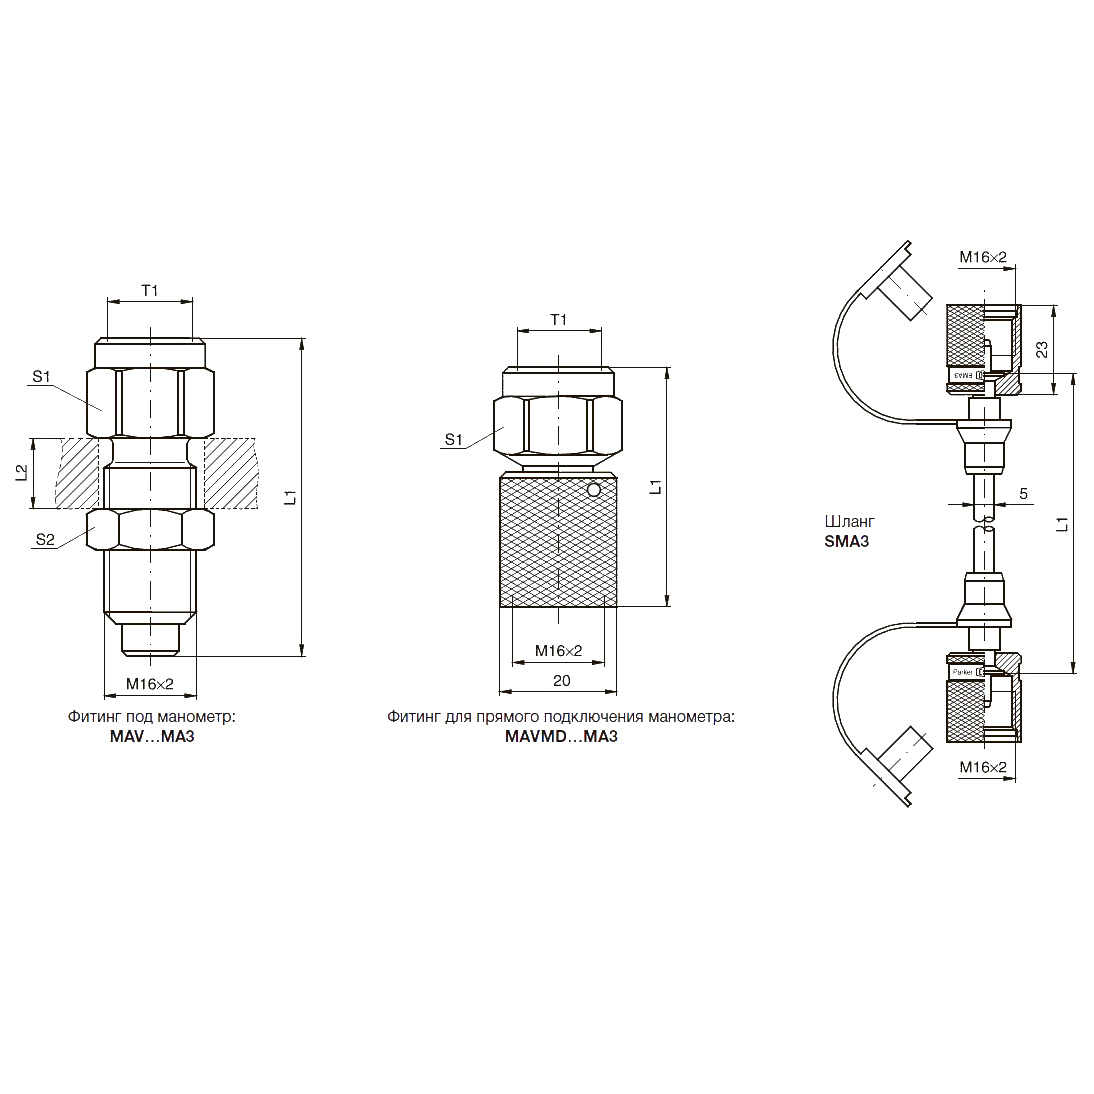 MAV-MA3 Фитинг под манометр с резьбовым соединением M 16х2 MAVMD…MA3